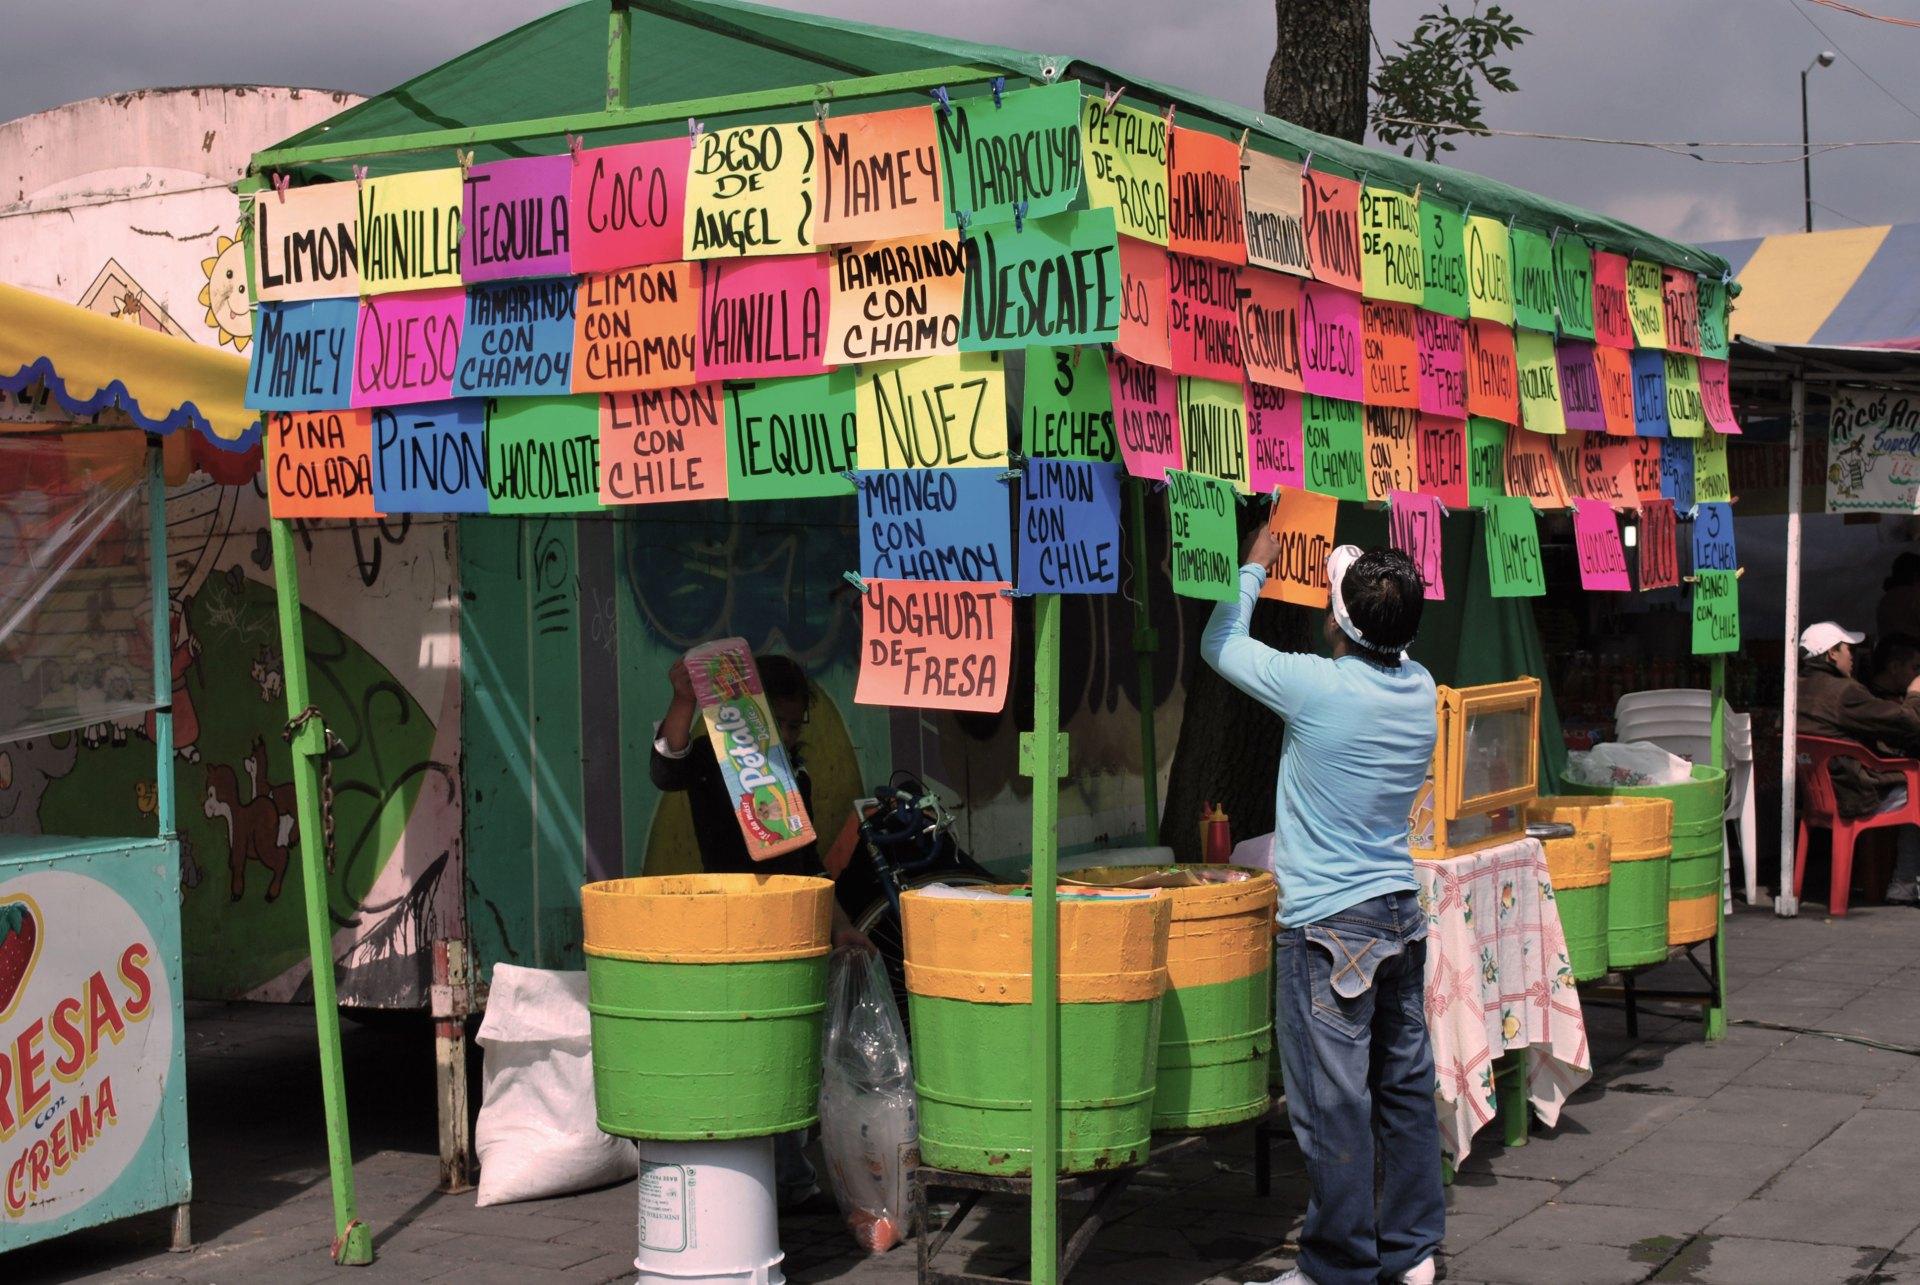 Mexico city ice cream street food stall